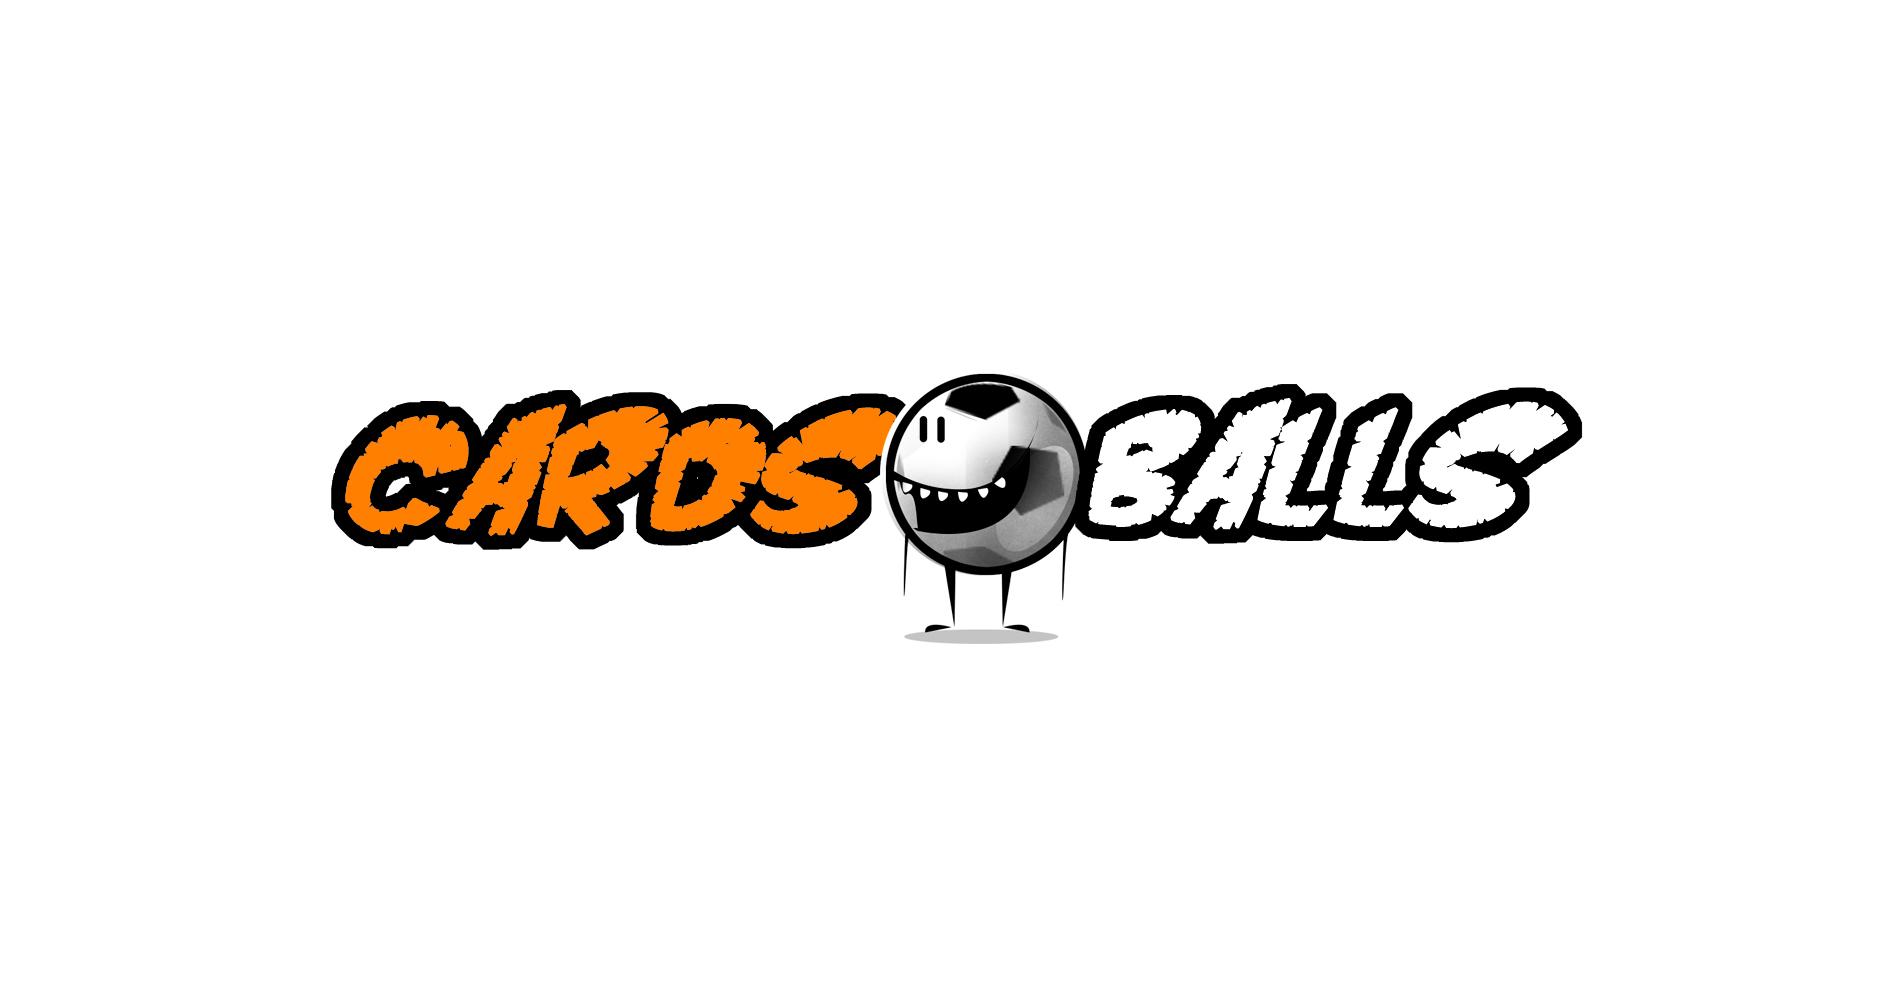 CardsAndBalls